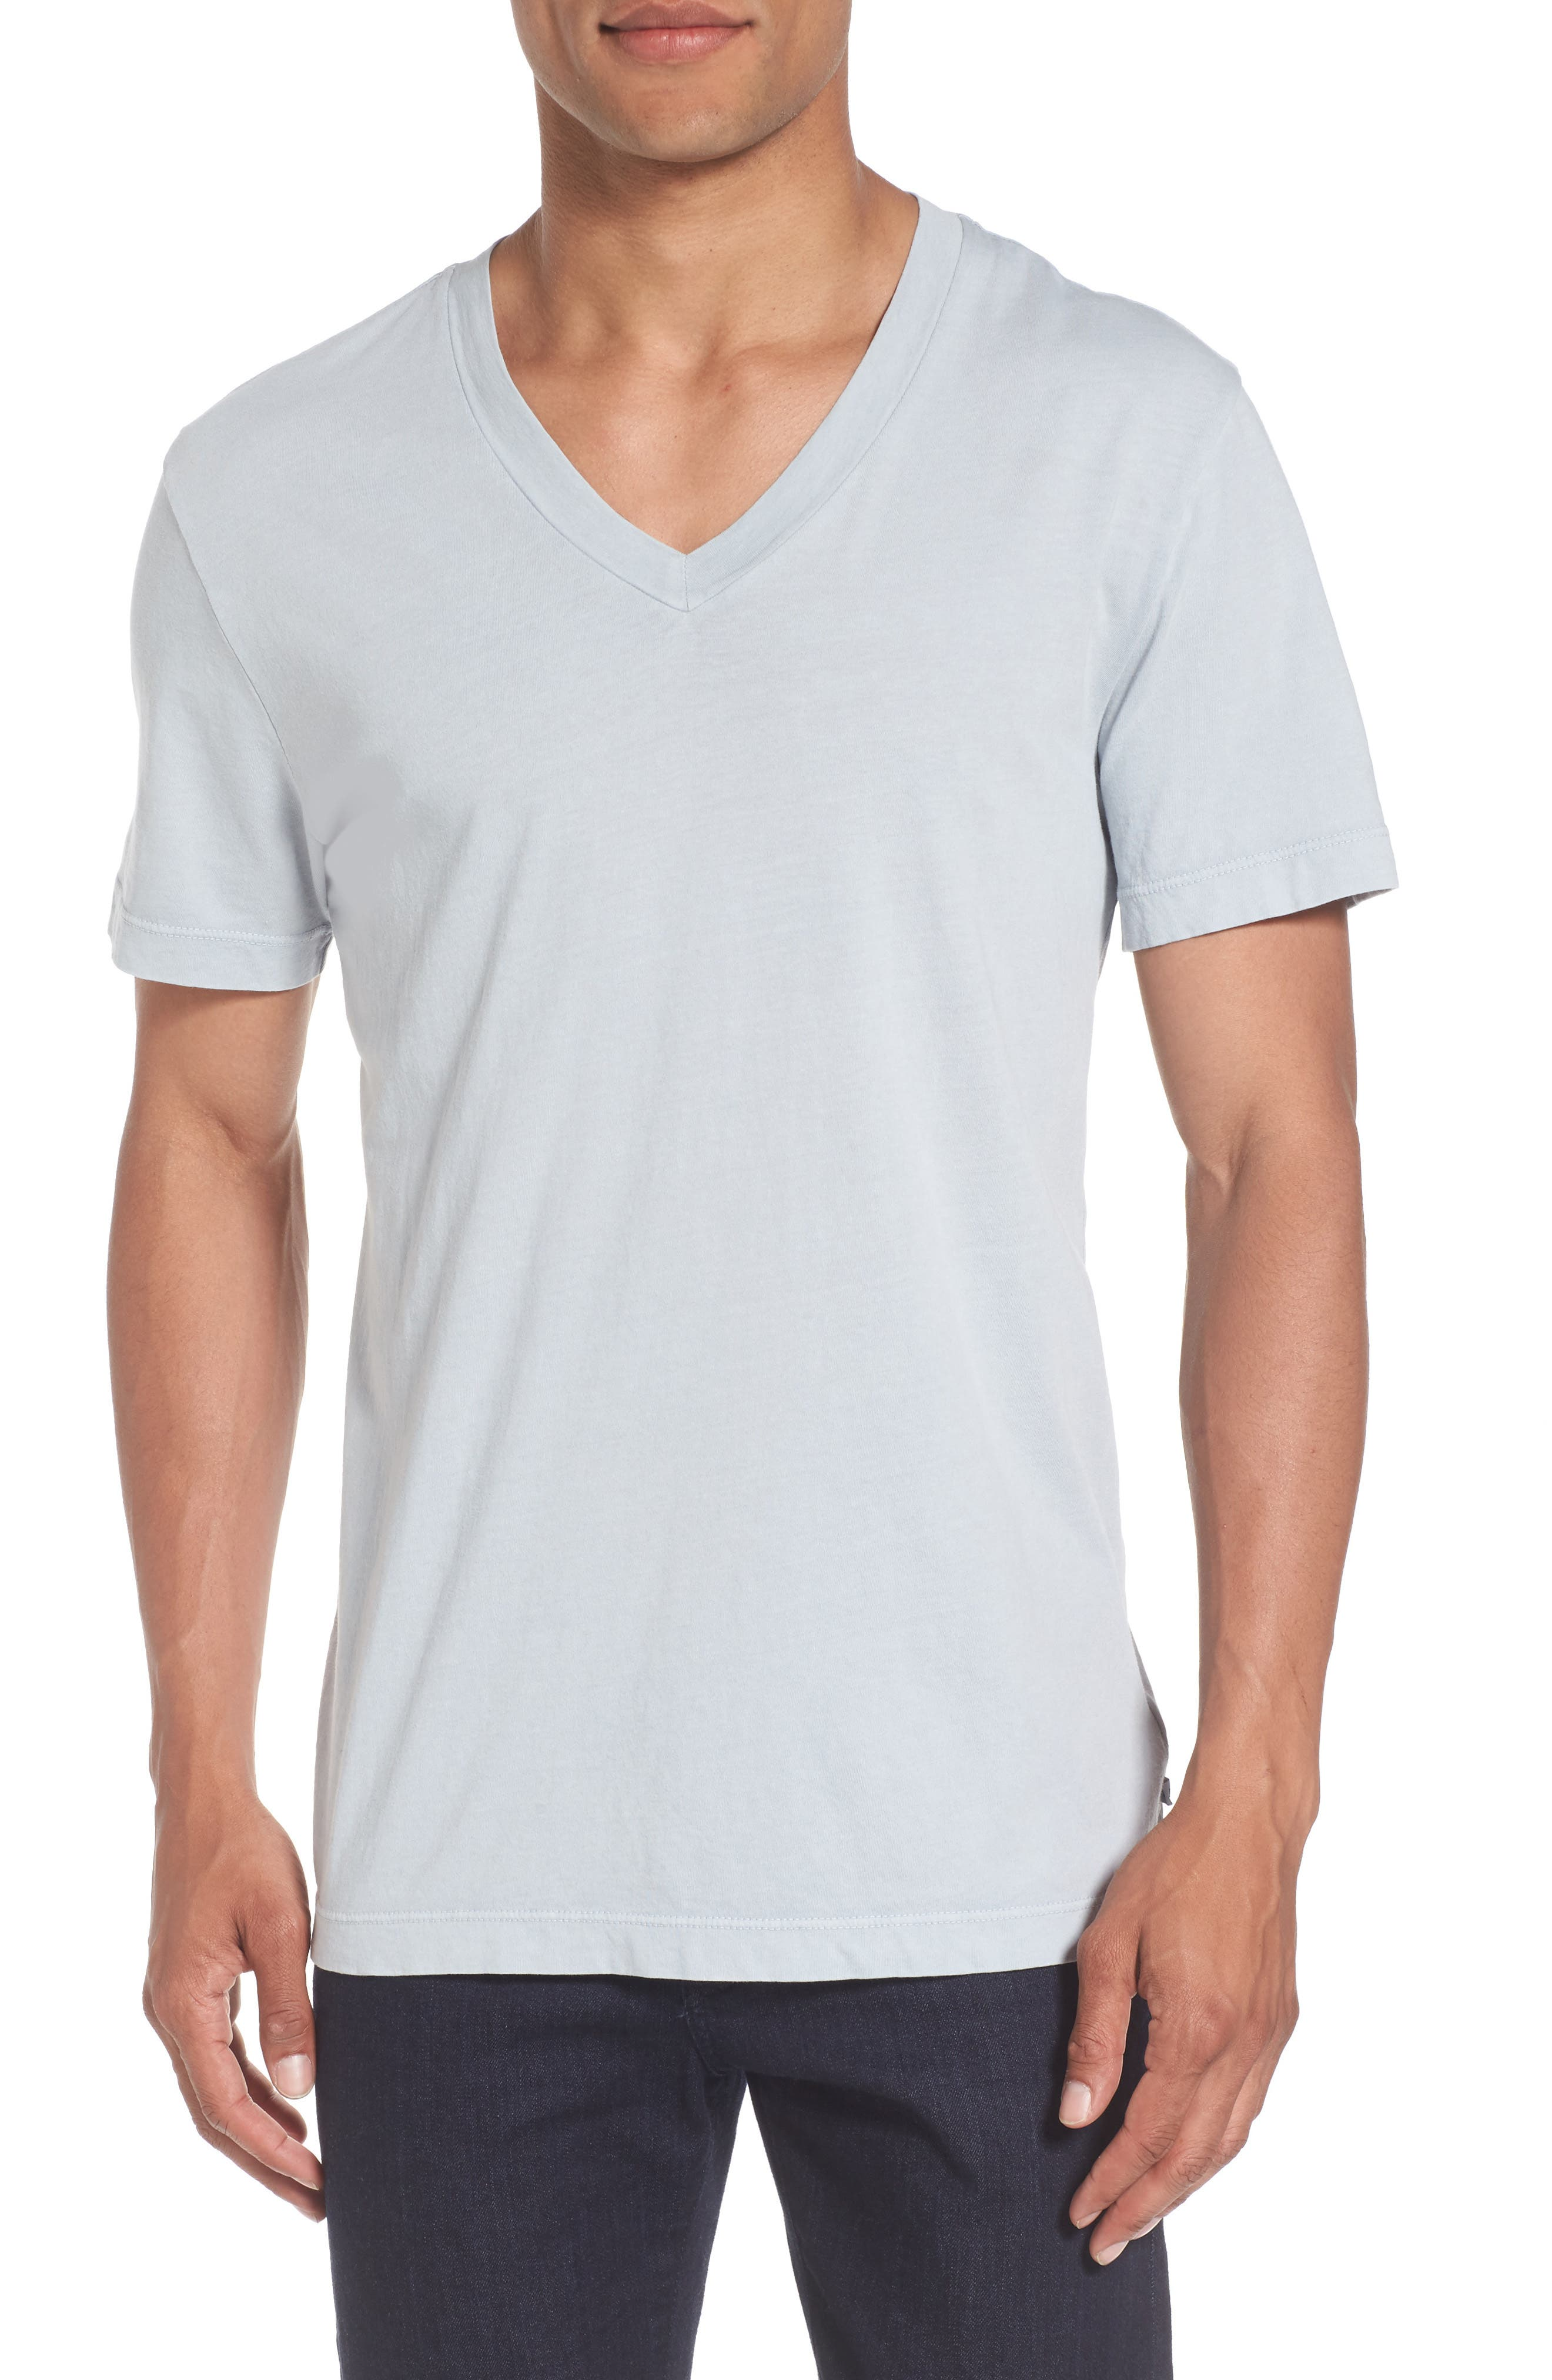 James Perse Short Sleeve V-Neck T-Shirt